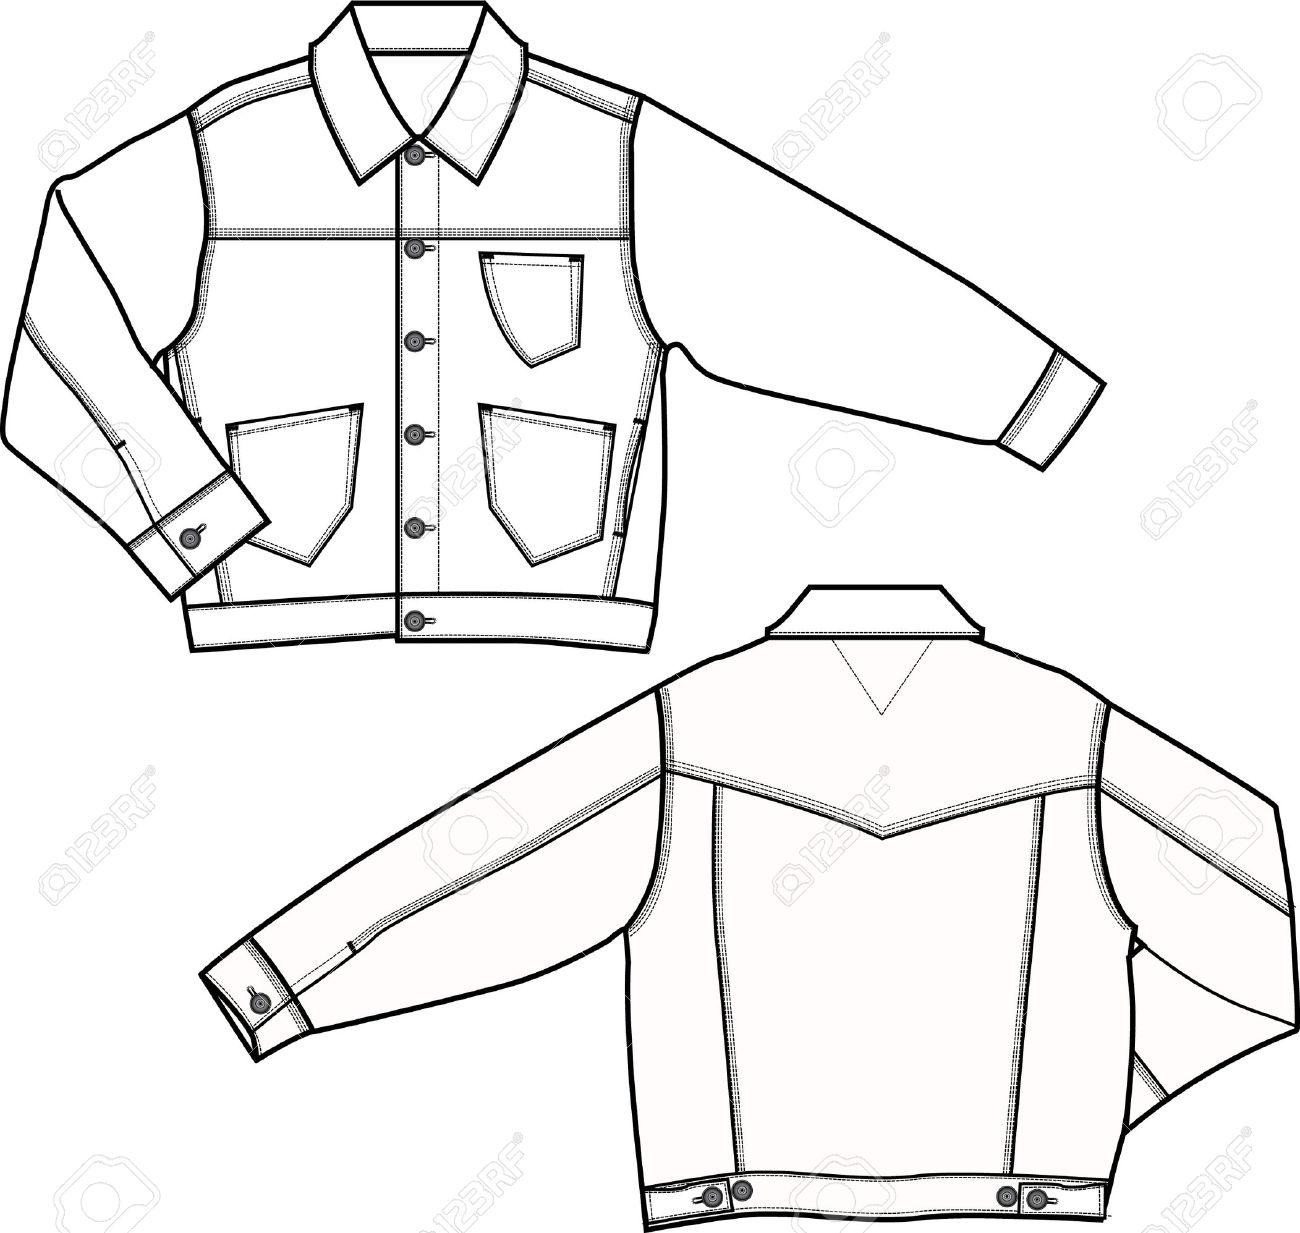 Coat Technical Drawing At Getdrawings